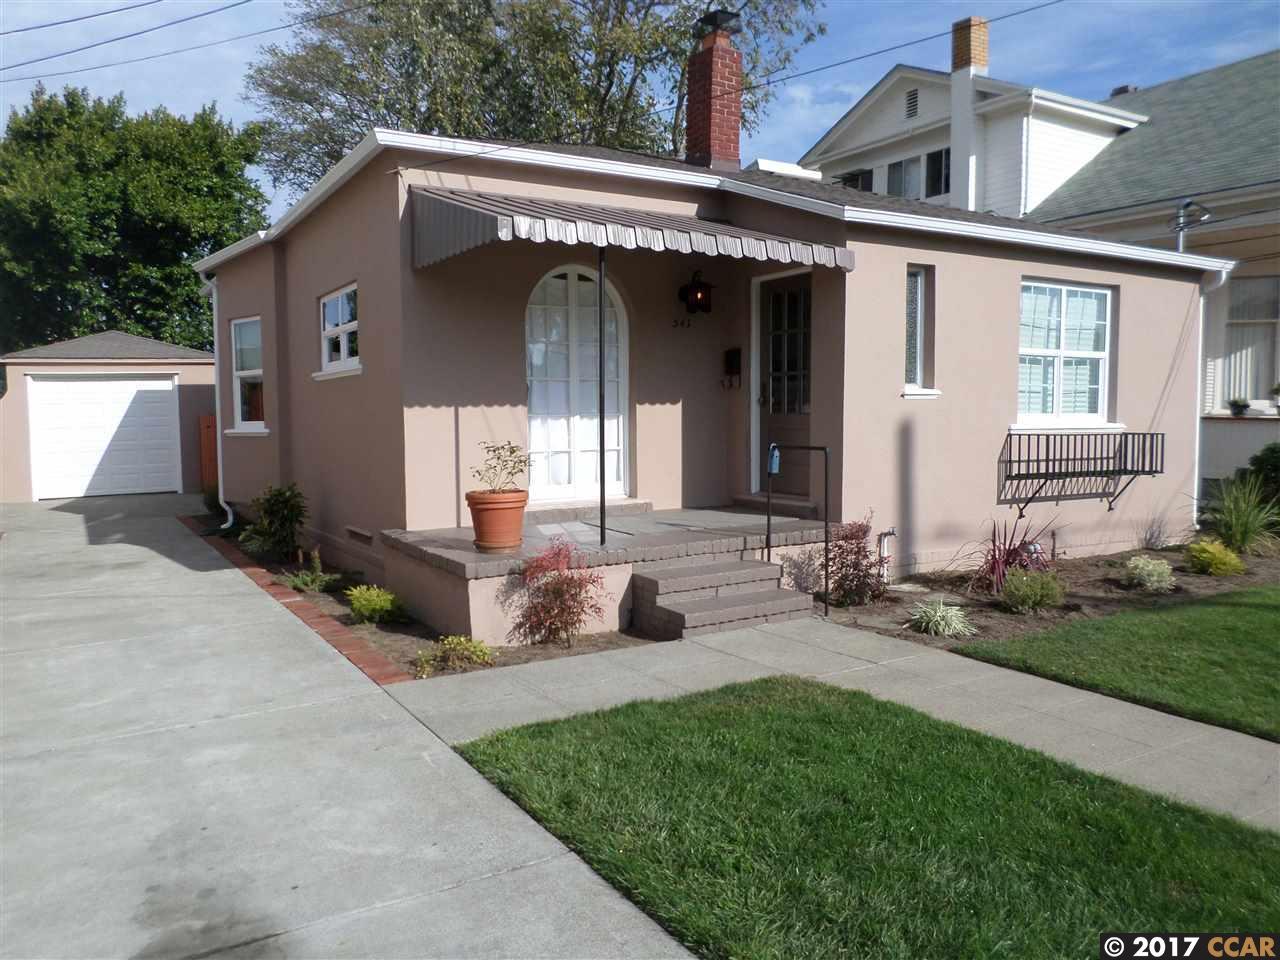 543 Lincoln Ave | ALAMEDA | 1131 | 94501